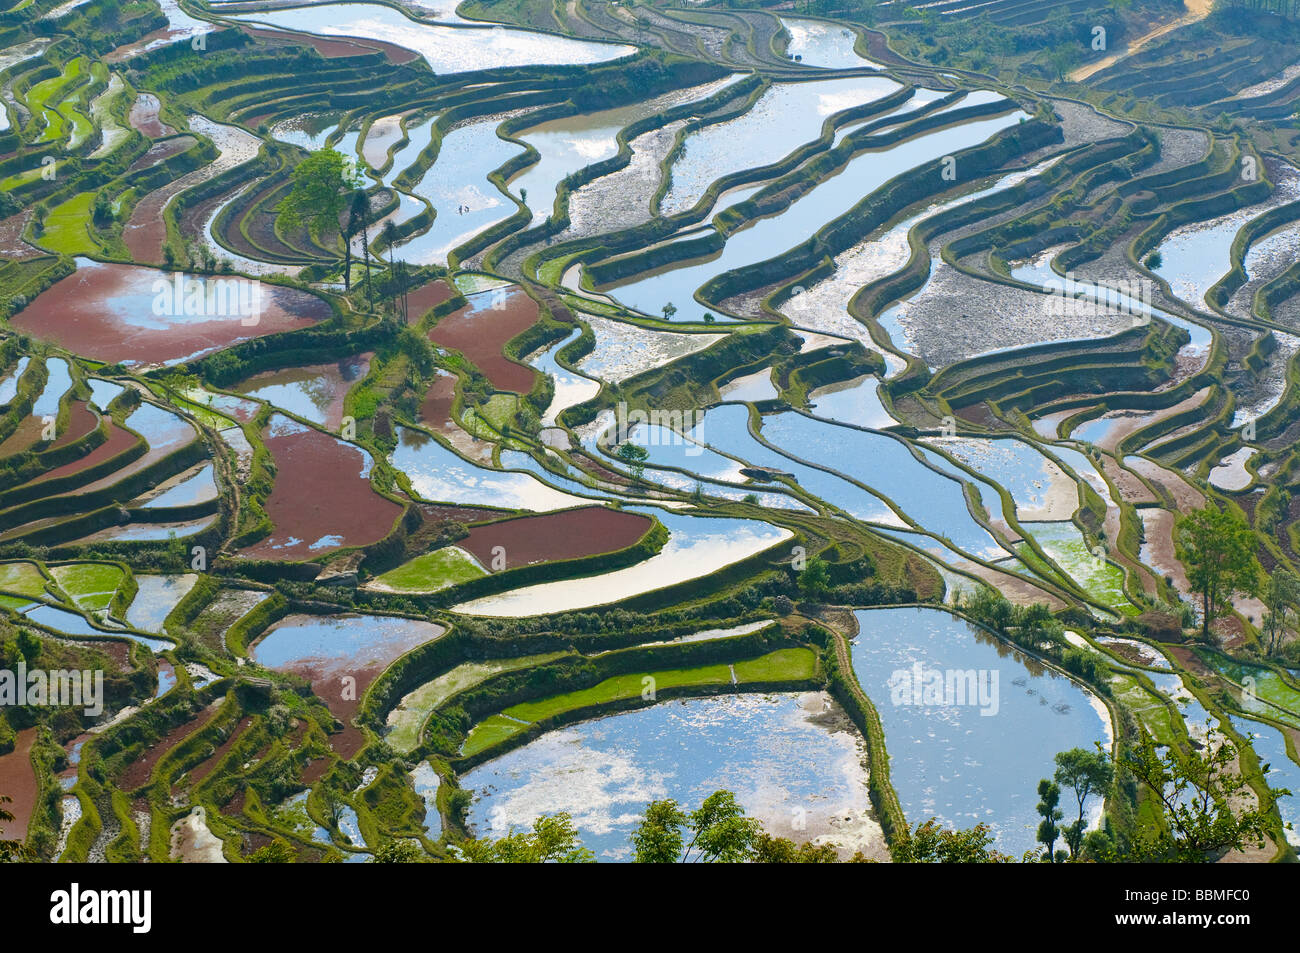 Les rizières en terrasses de yuanyang yunnan chine Photo Stock